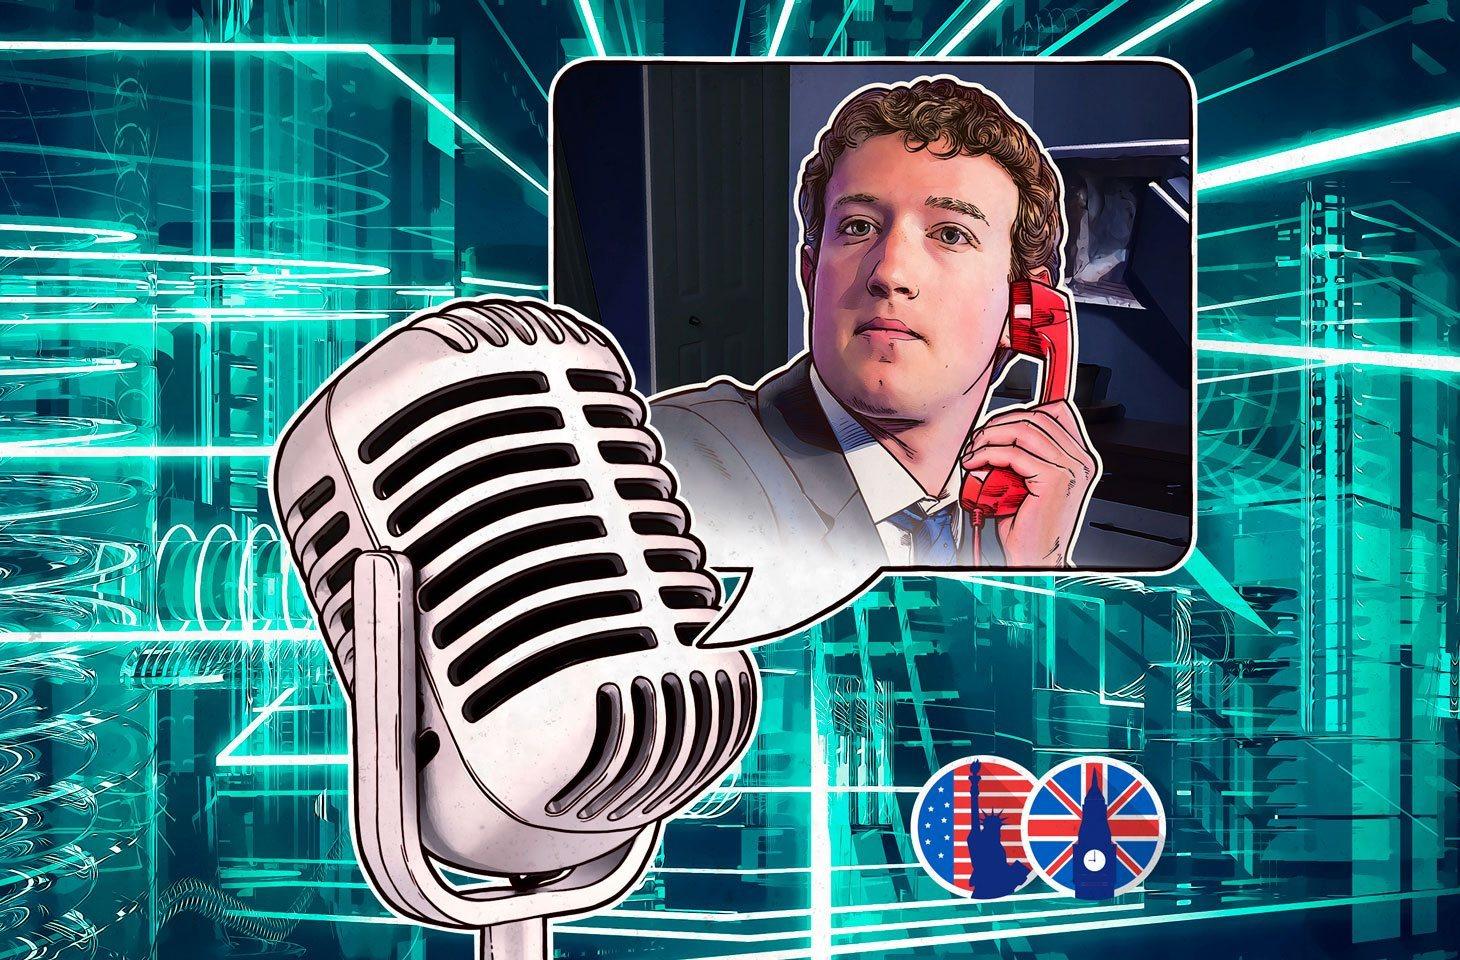 Kaspersky podcast: Should governments have a back door for encrypted messages?